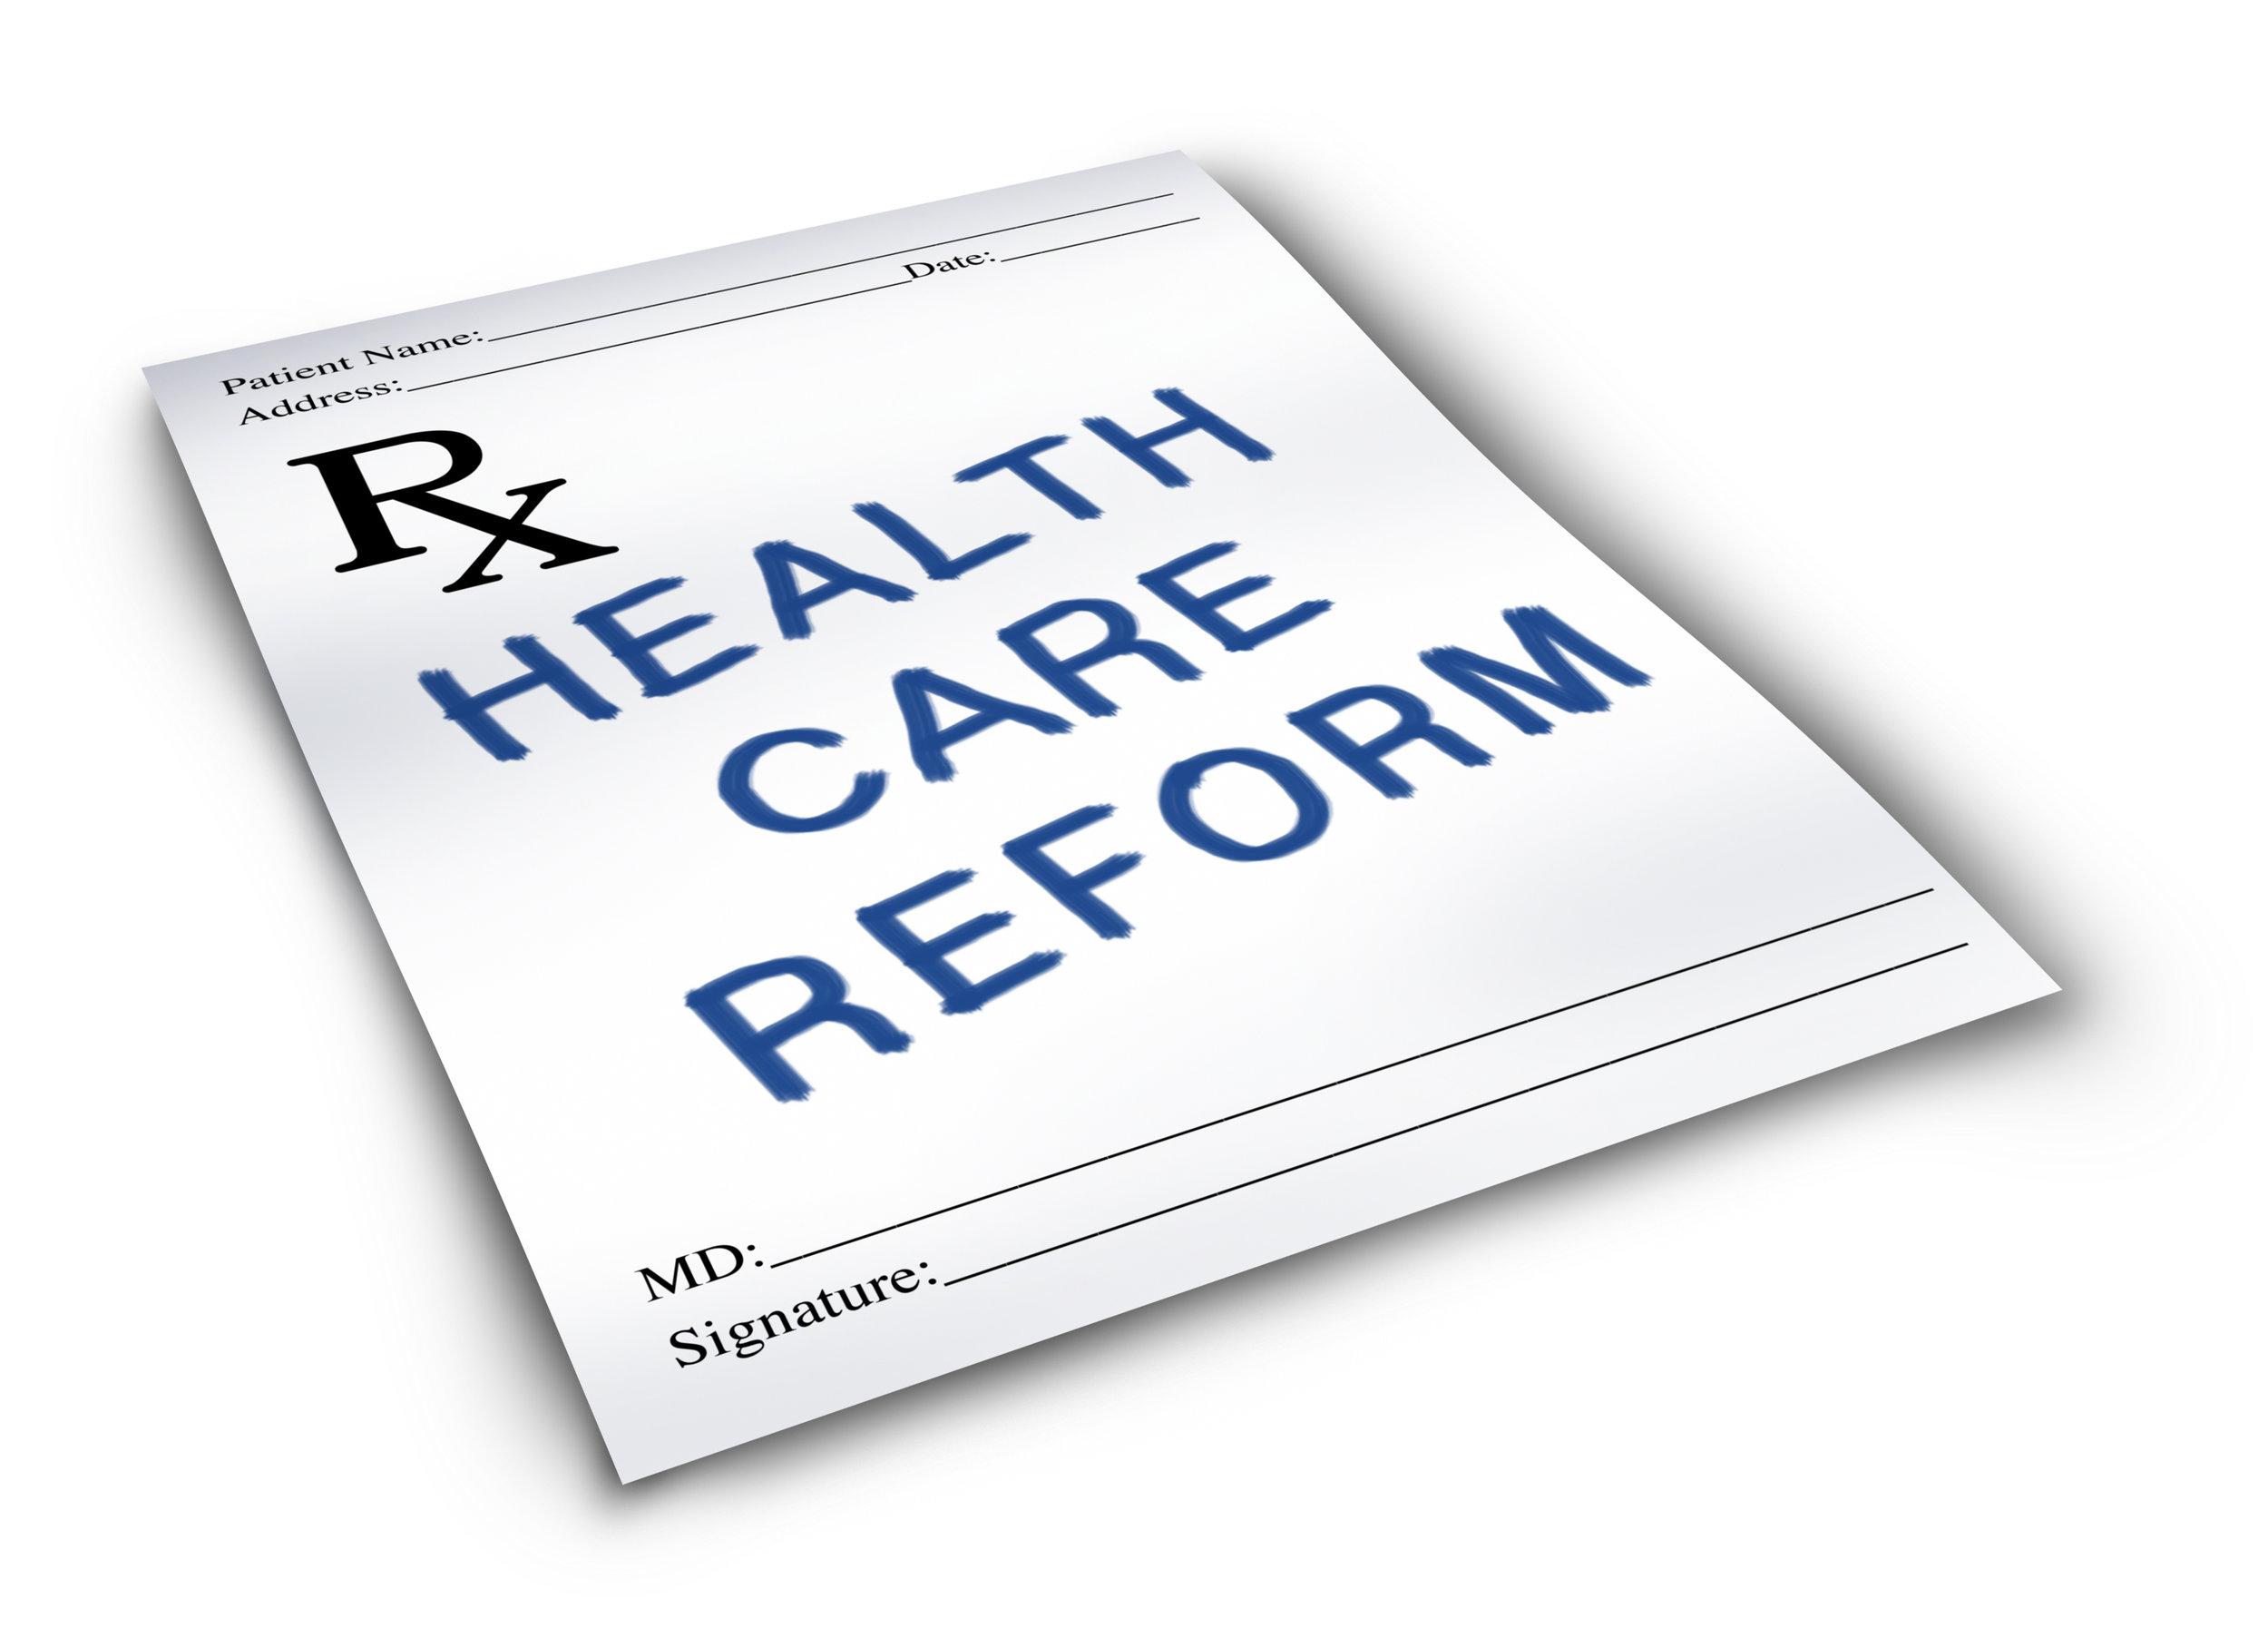 Healthcare Reform Rx cannabis PROPOSED REGULATIONS.jpg